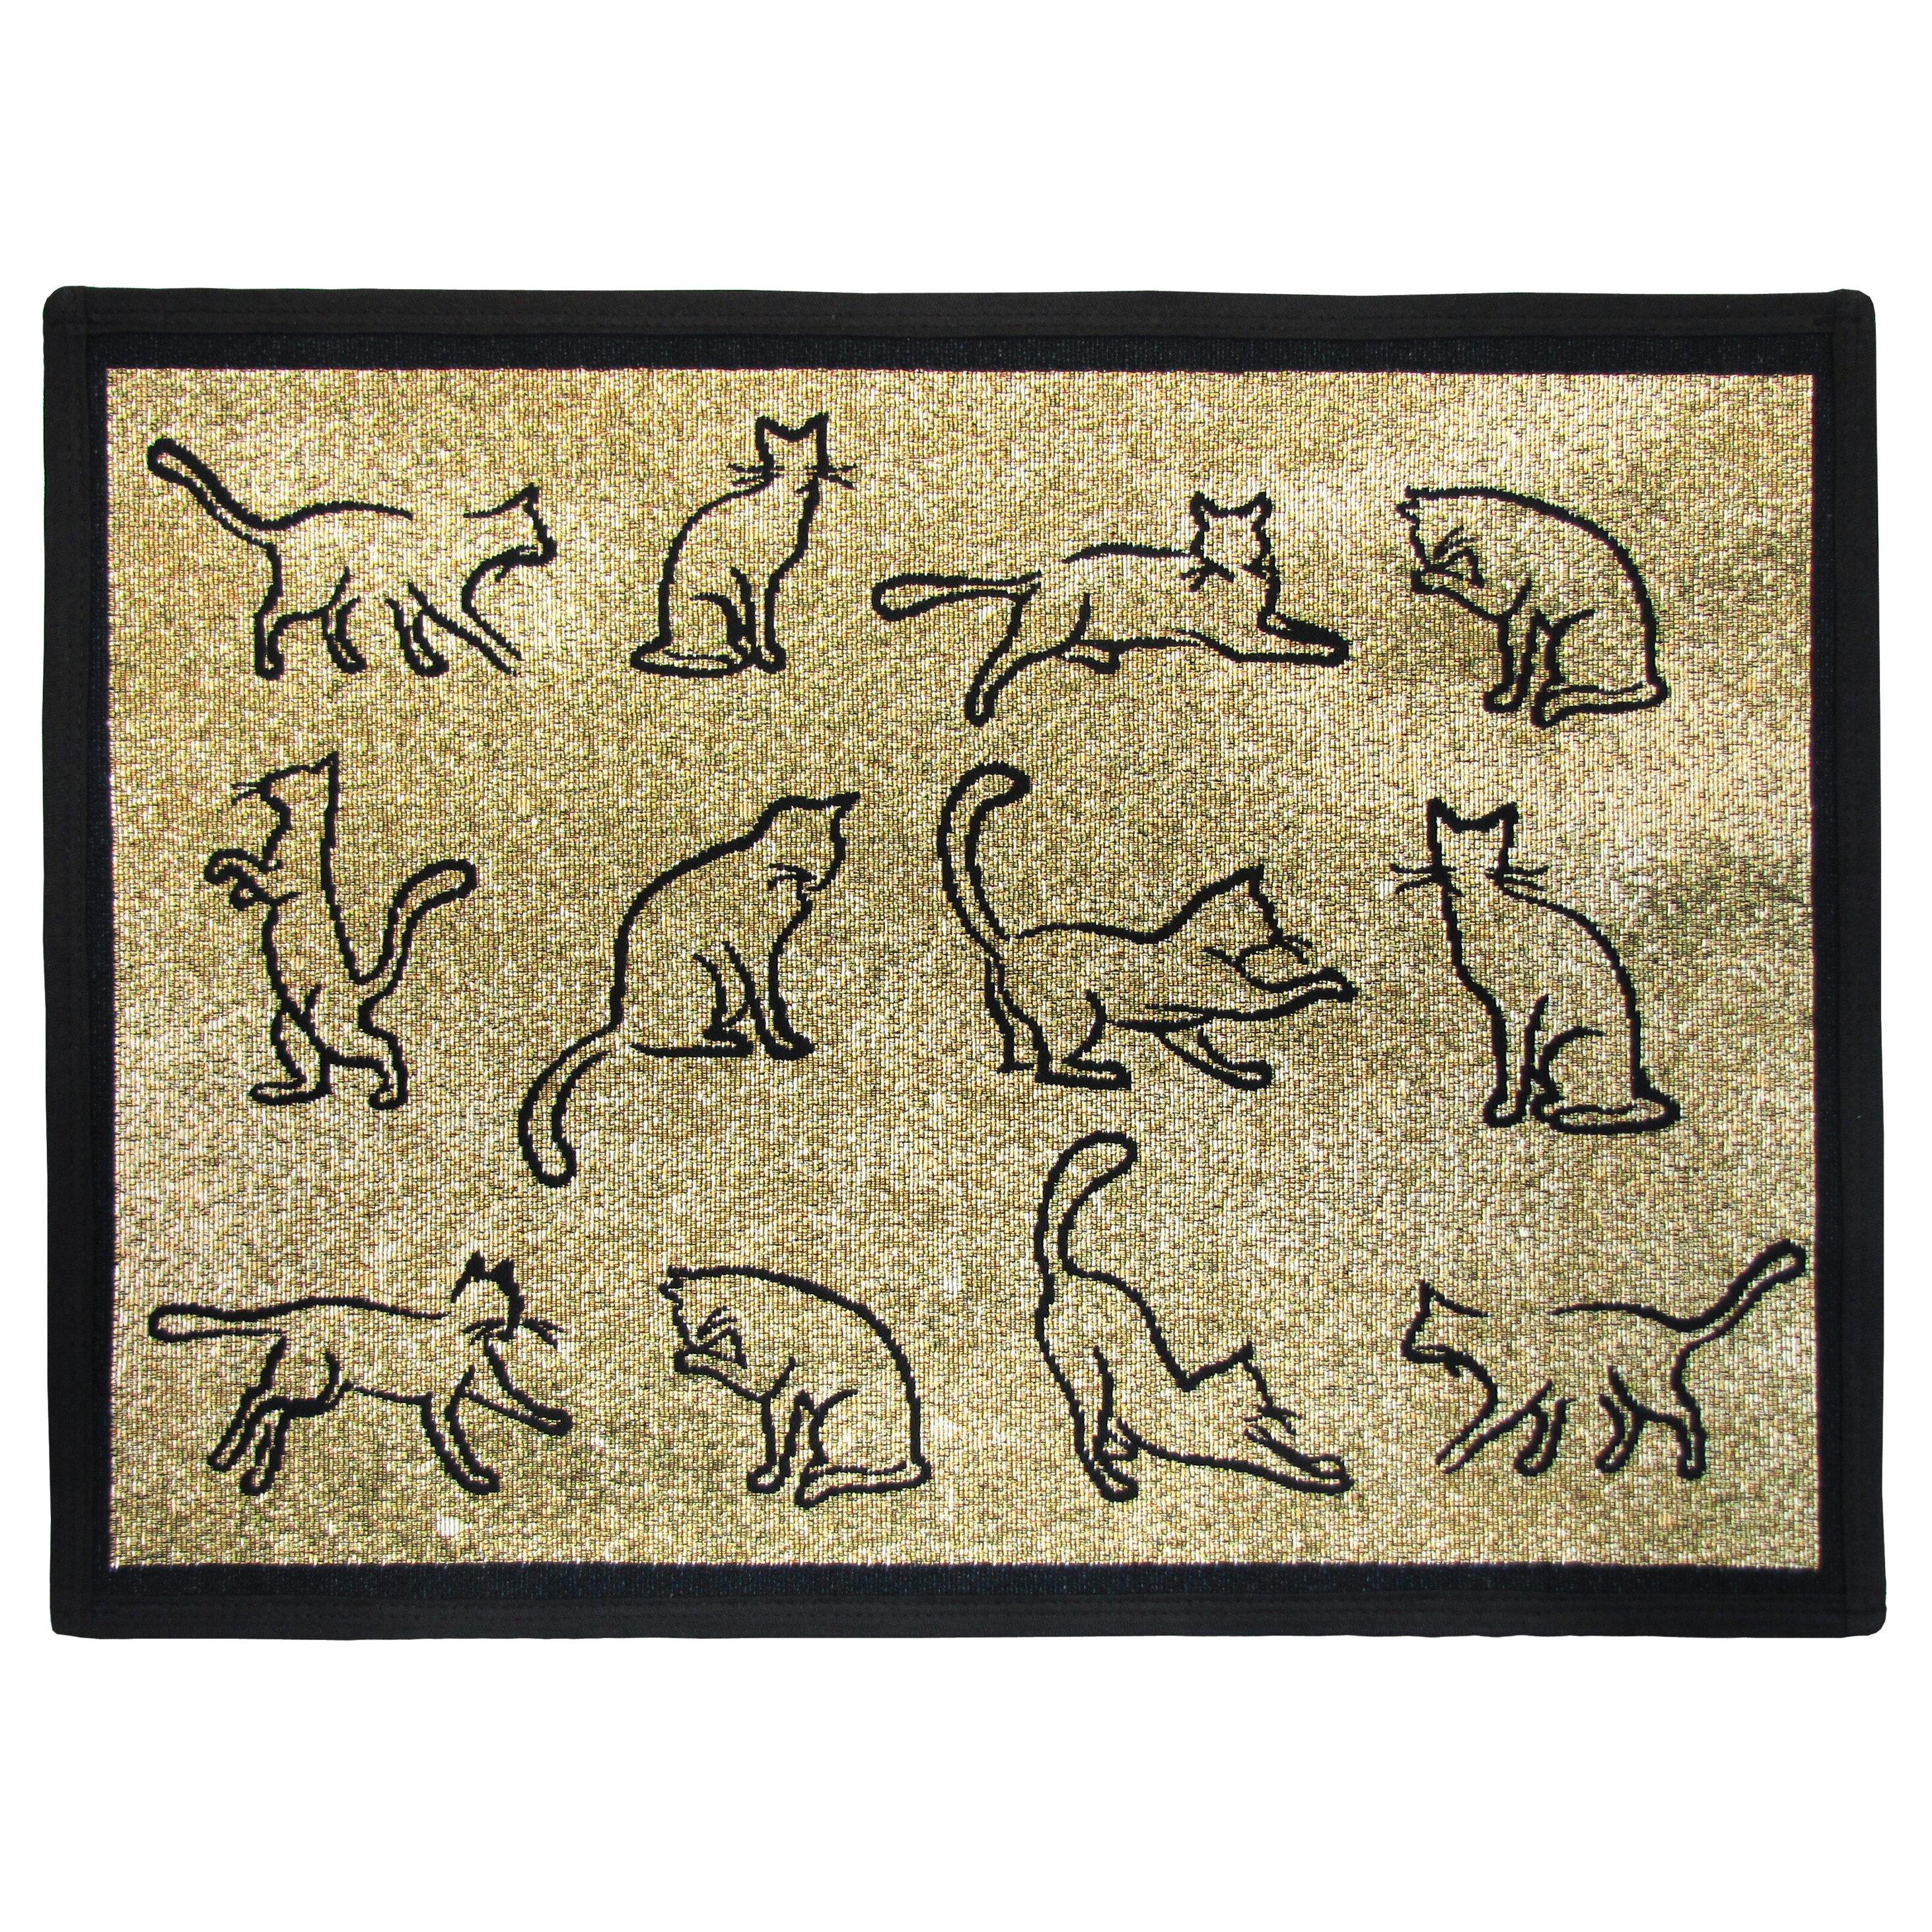 Pb Paws Amp Co Gold Black Kitten Fun Tapestry Indoor